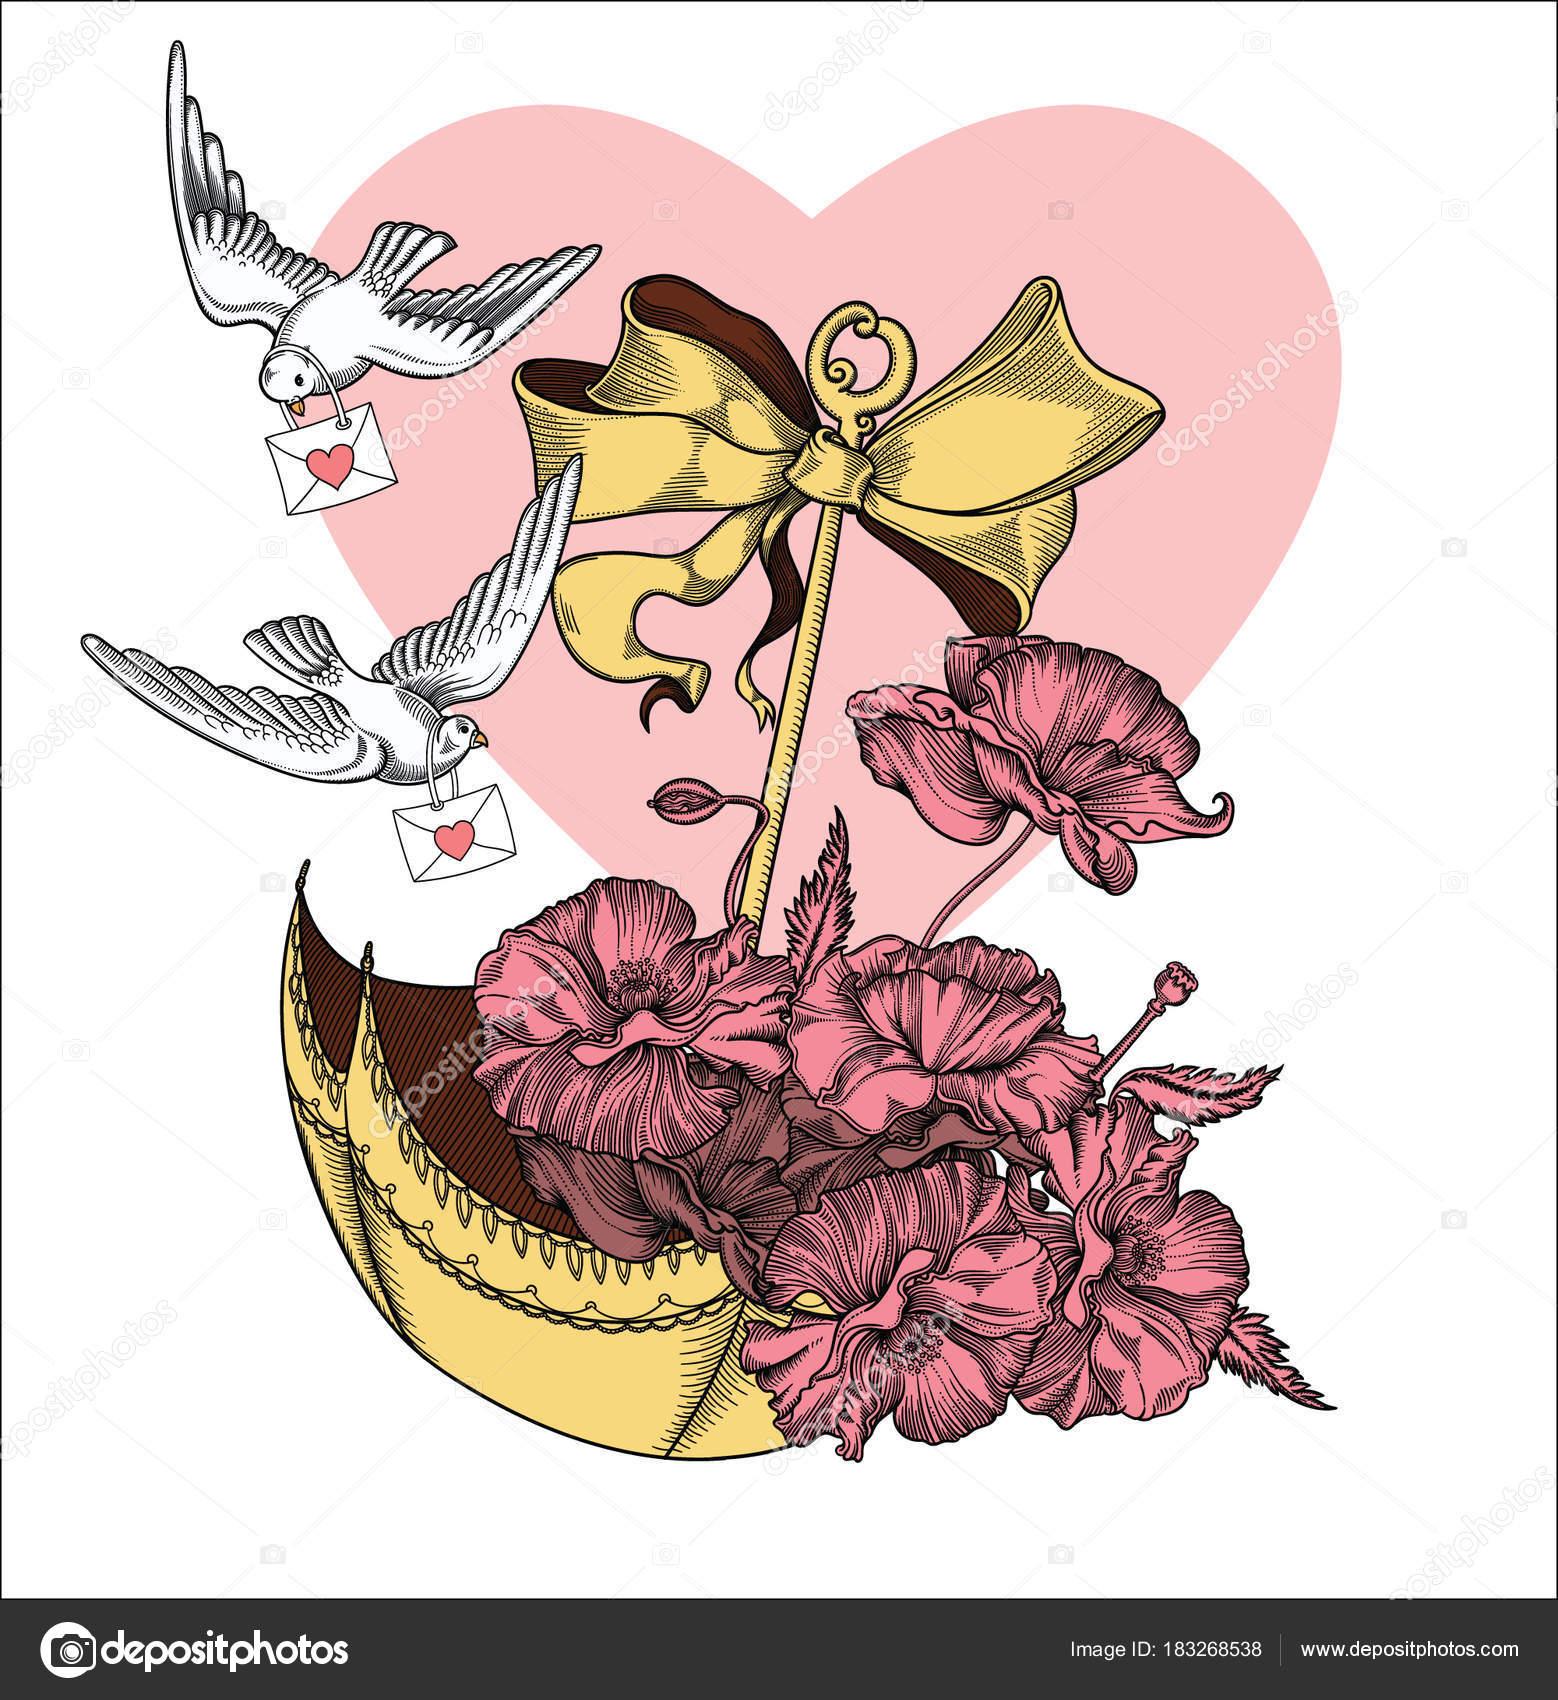 Valentines Day Vintage Card Illustrationolated On White